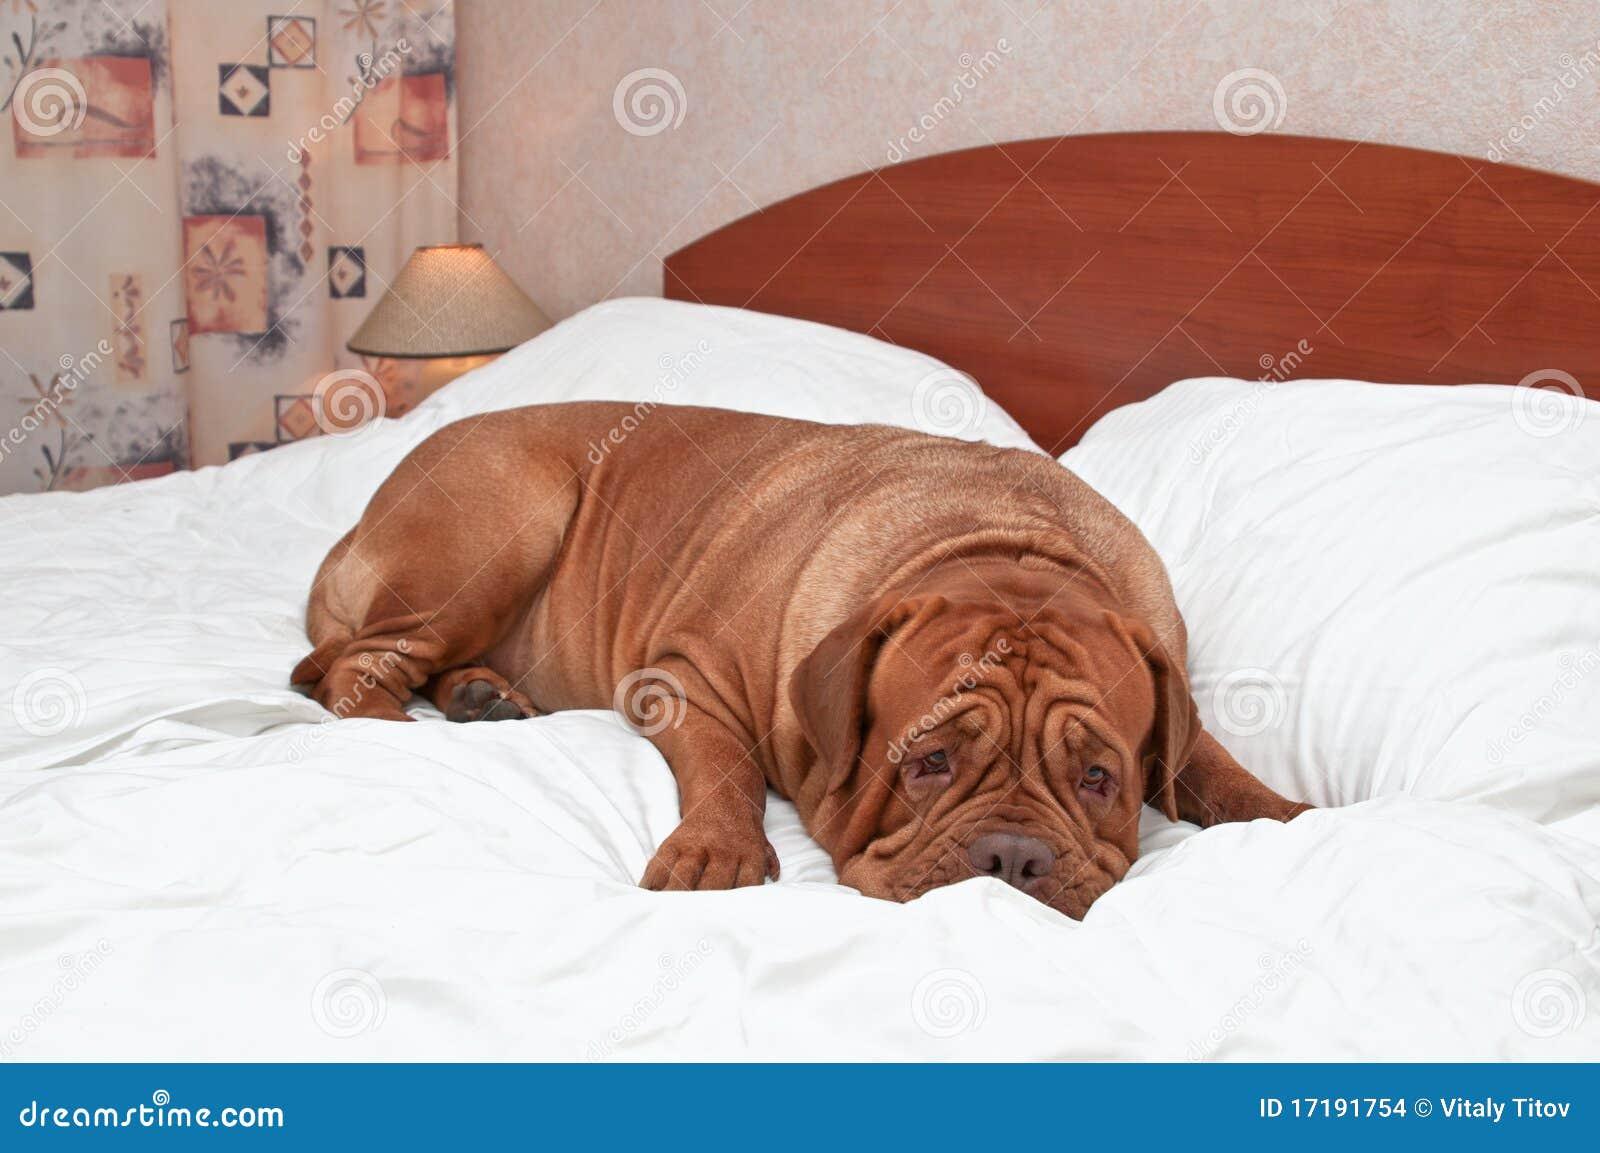 Goodnight Dog Stock Images - Image: 17191754